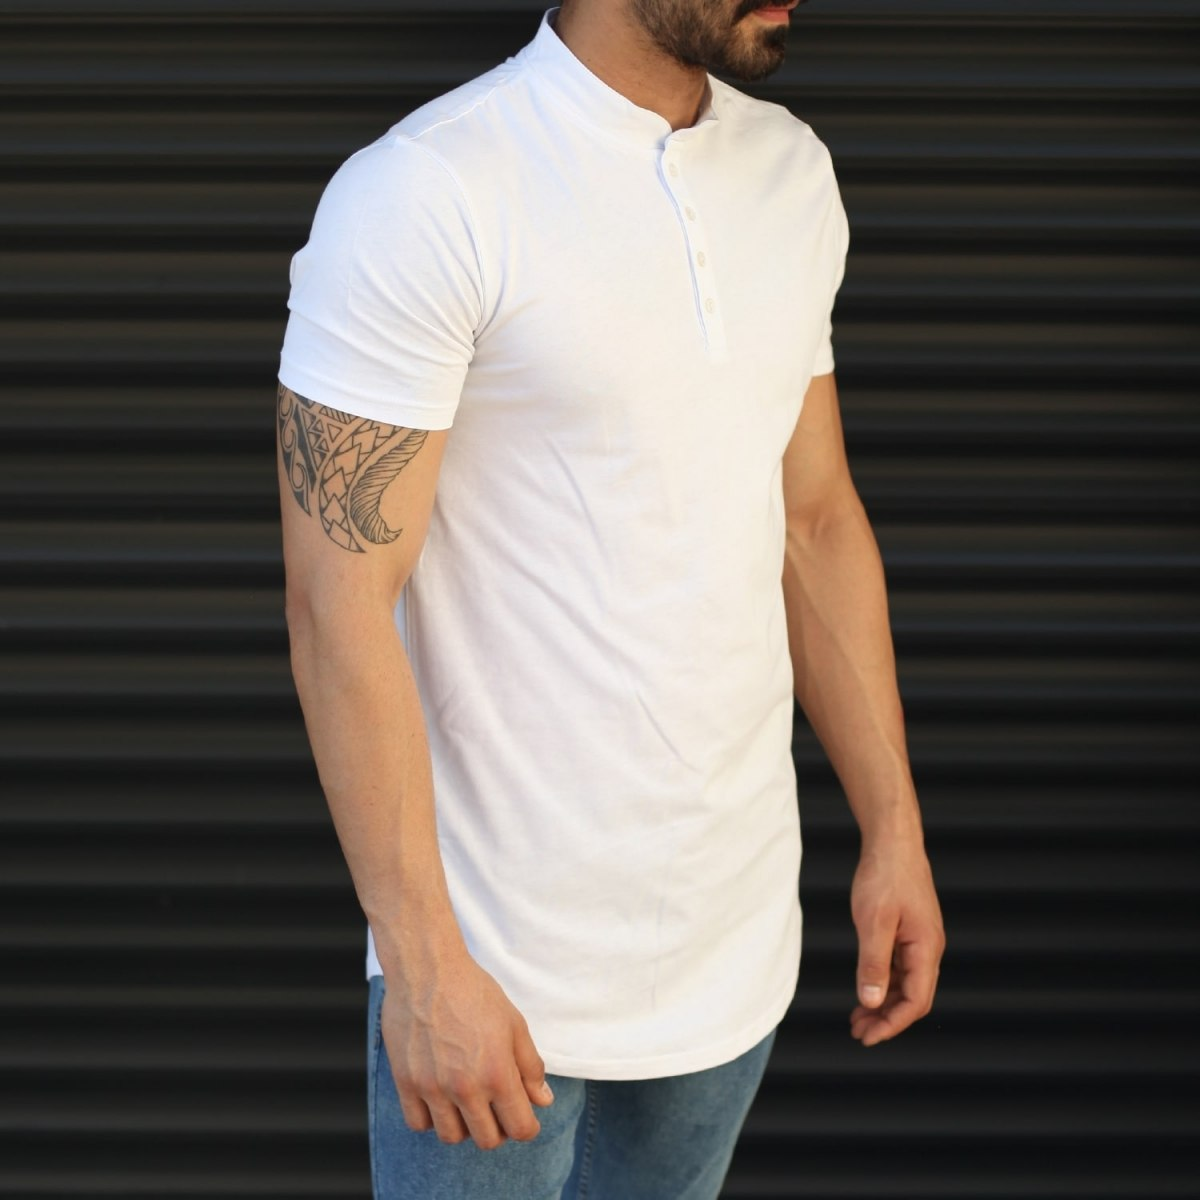 Men's Button Neck Basic Tall T-Shirt In White Mv Premium Brand - 1